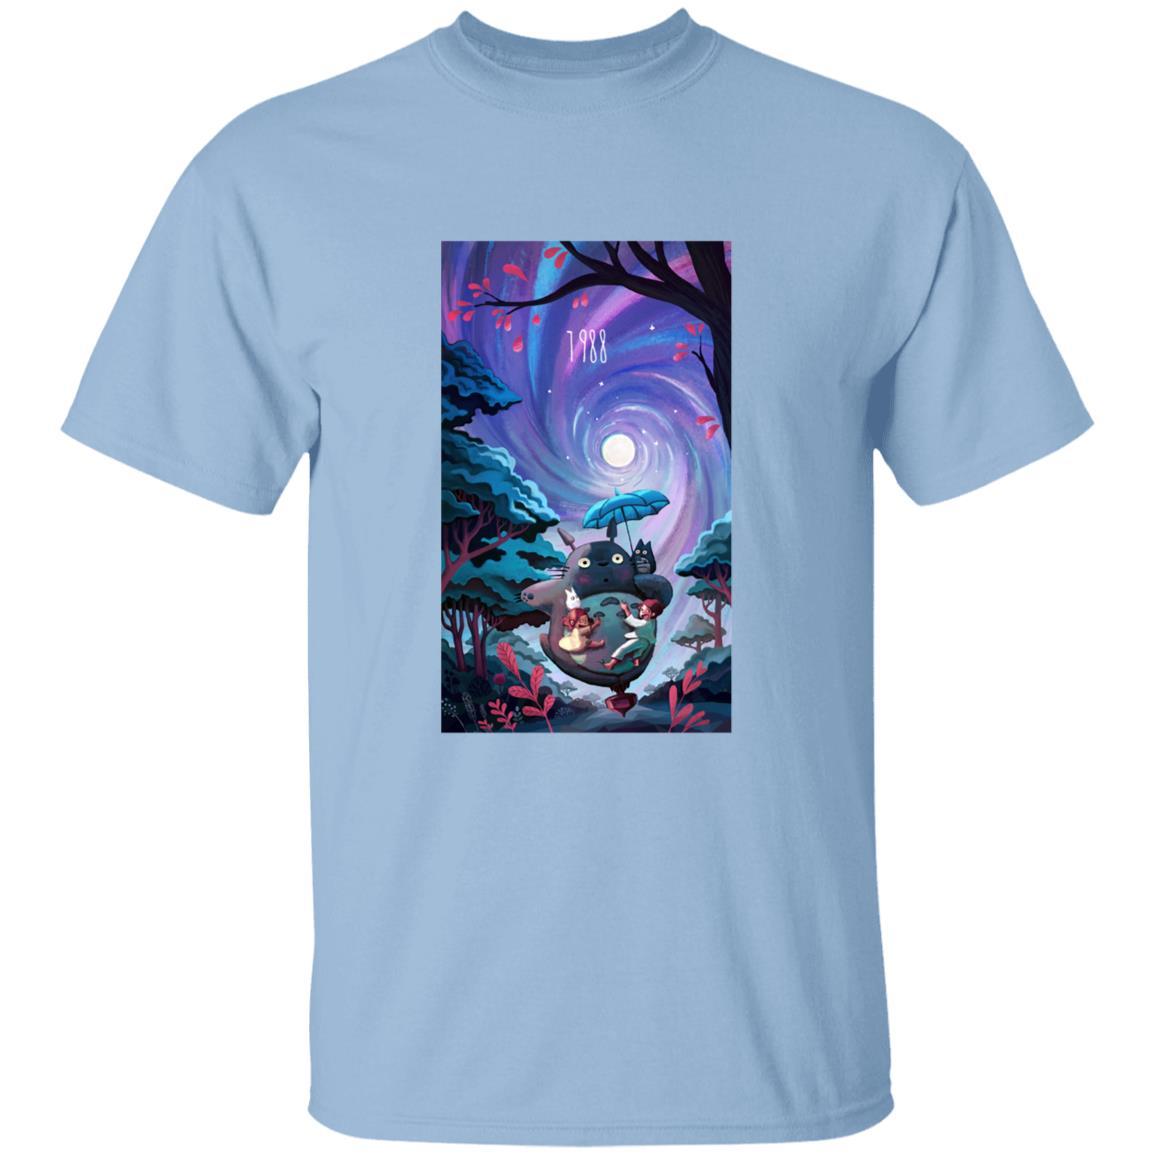 My Neighbor Totoro 1988 Illustration T Shirt